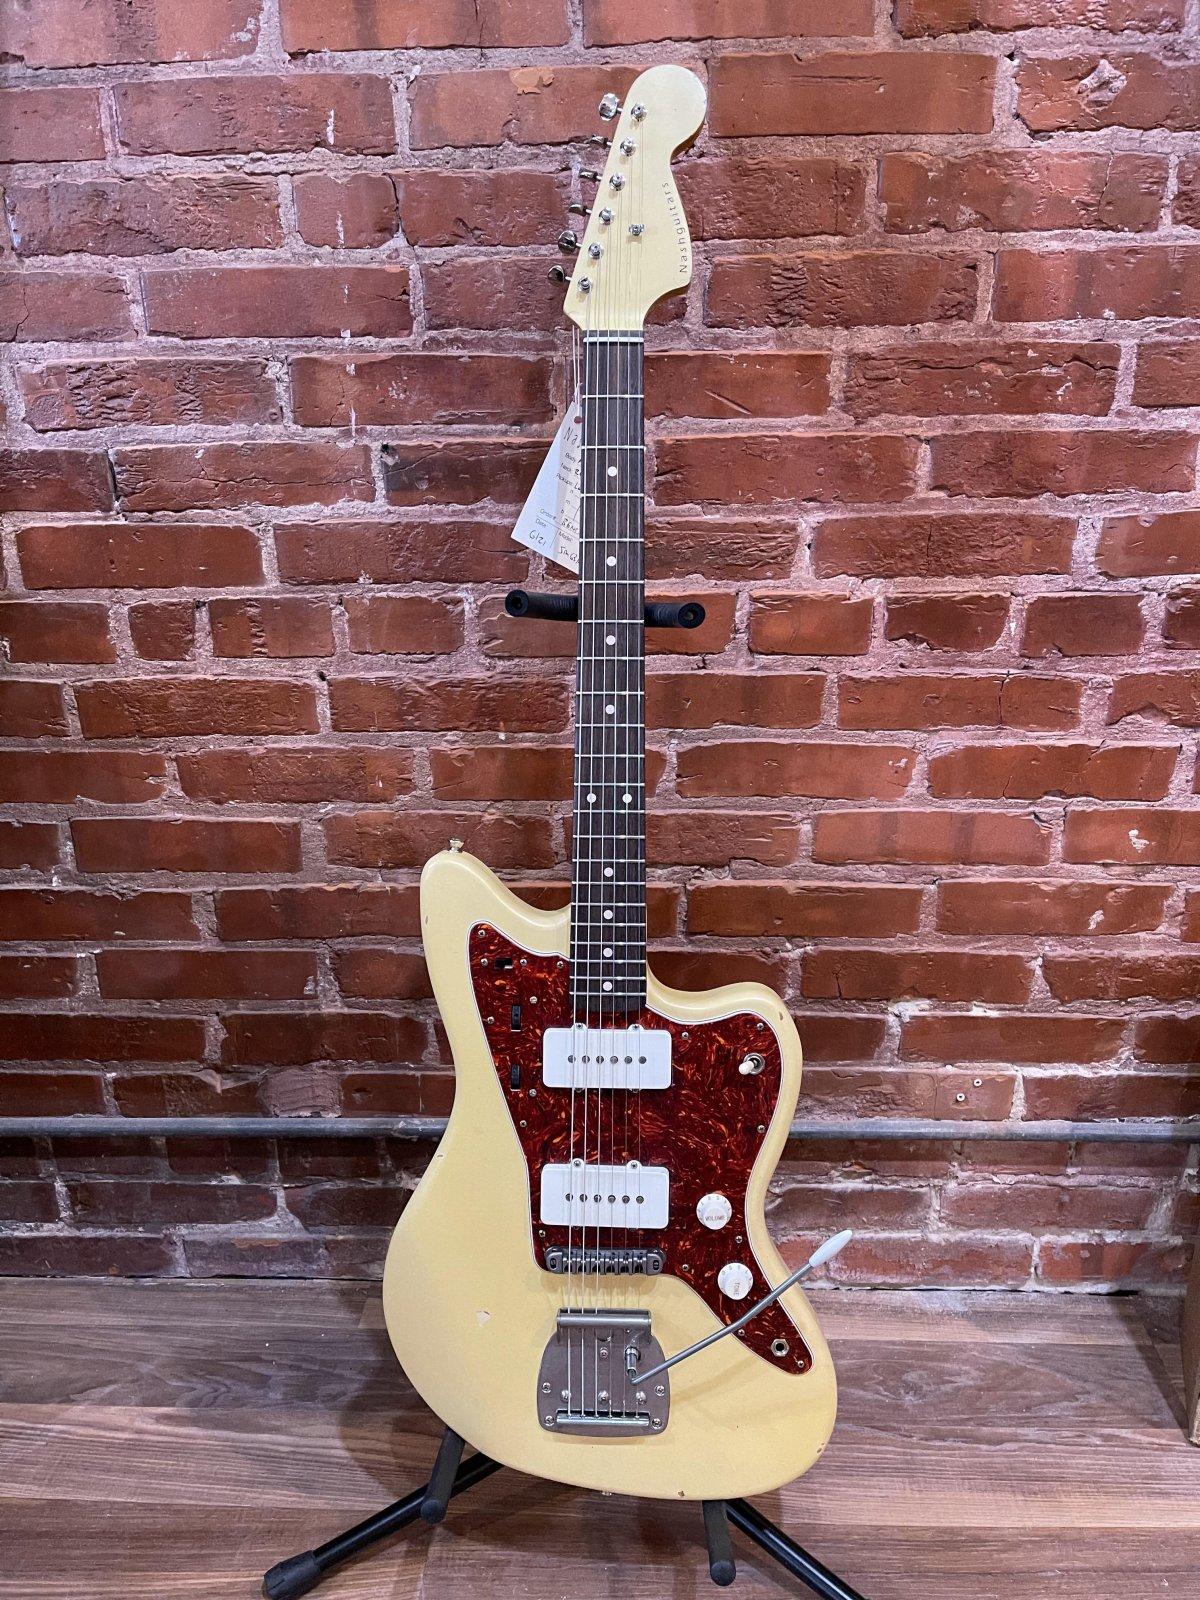 Nash Guitars JM63 Guitar Vintage White